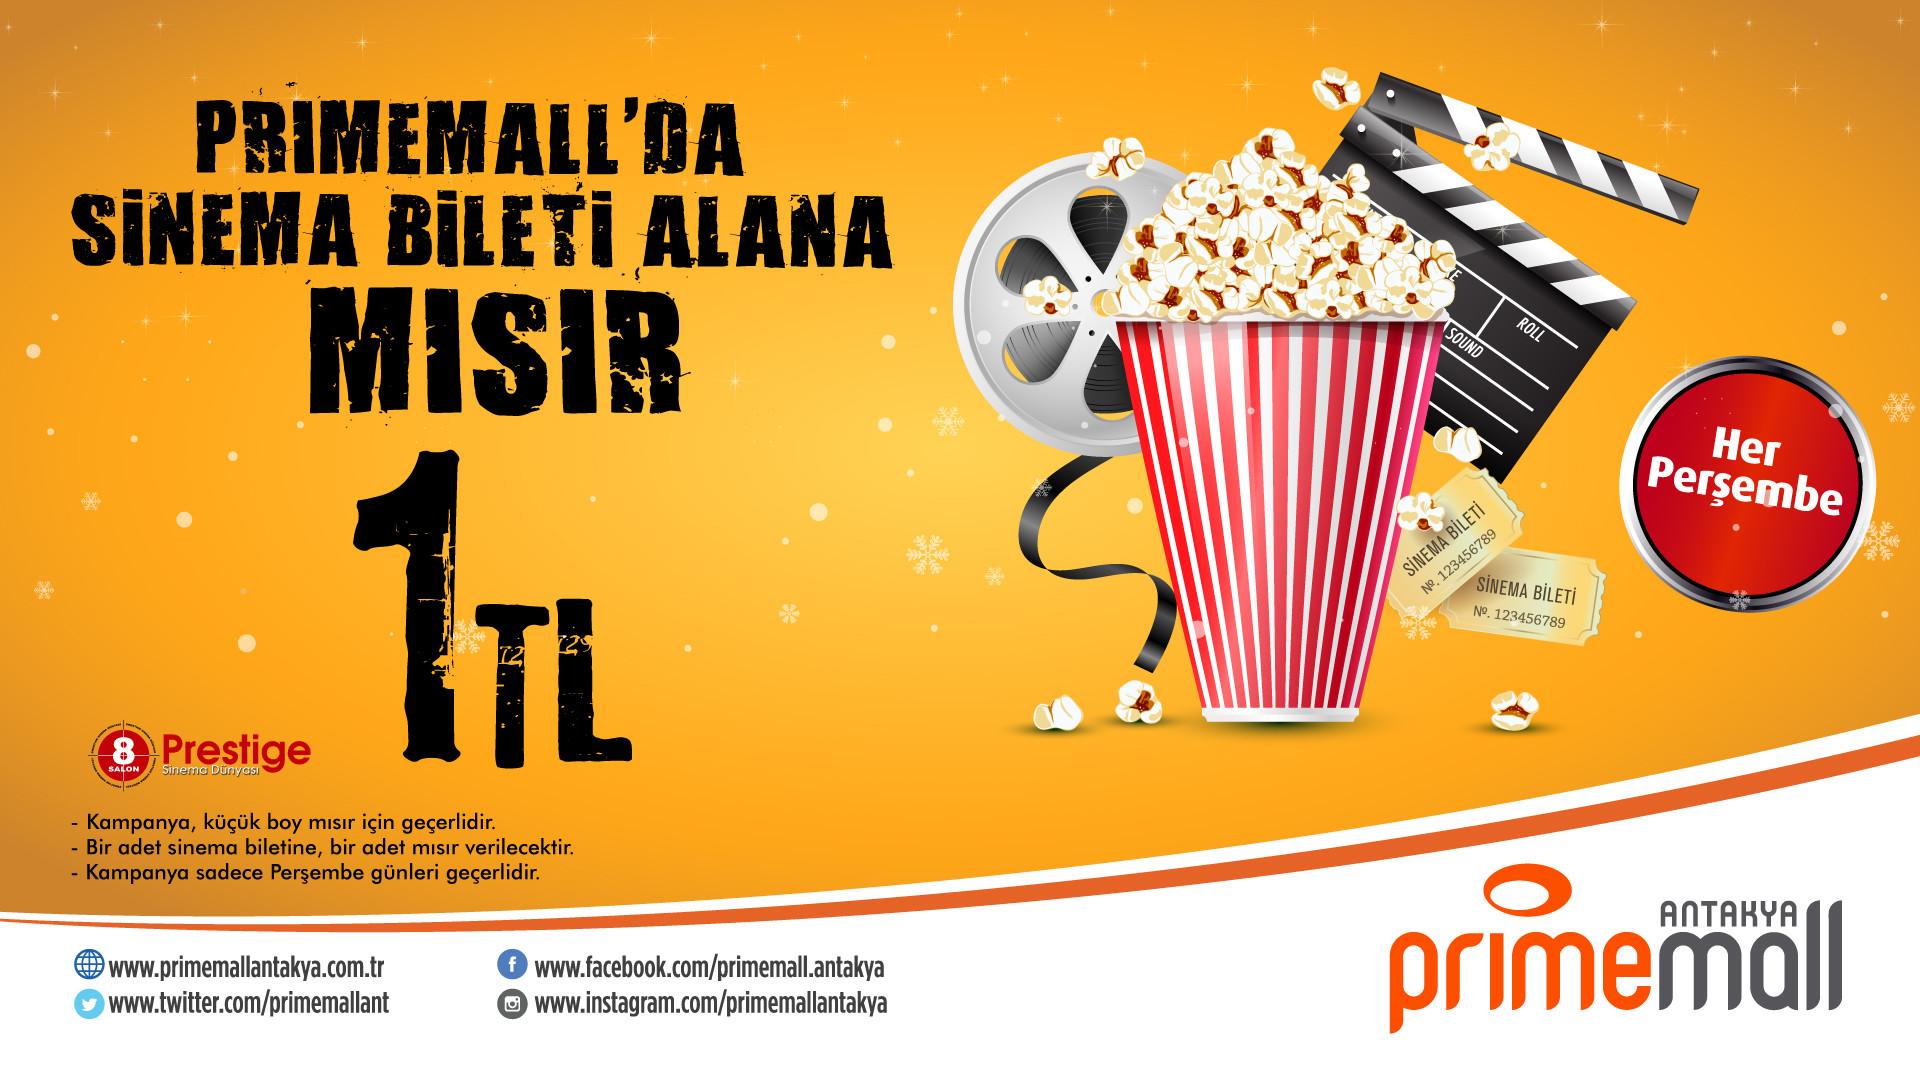 Primemall'da Sinema Bileti Alana Mısır 1 TL